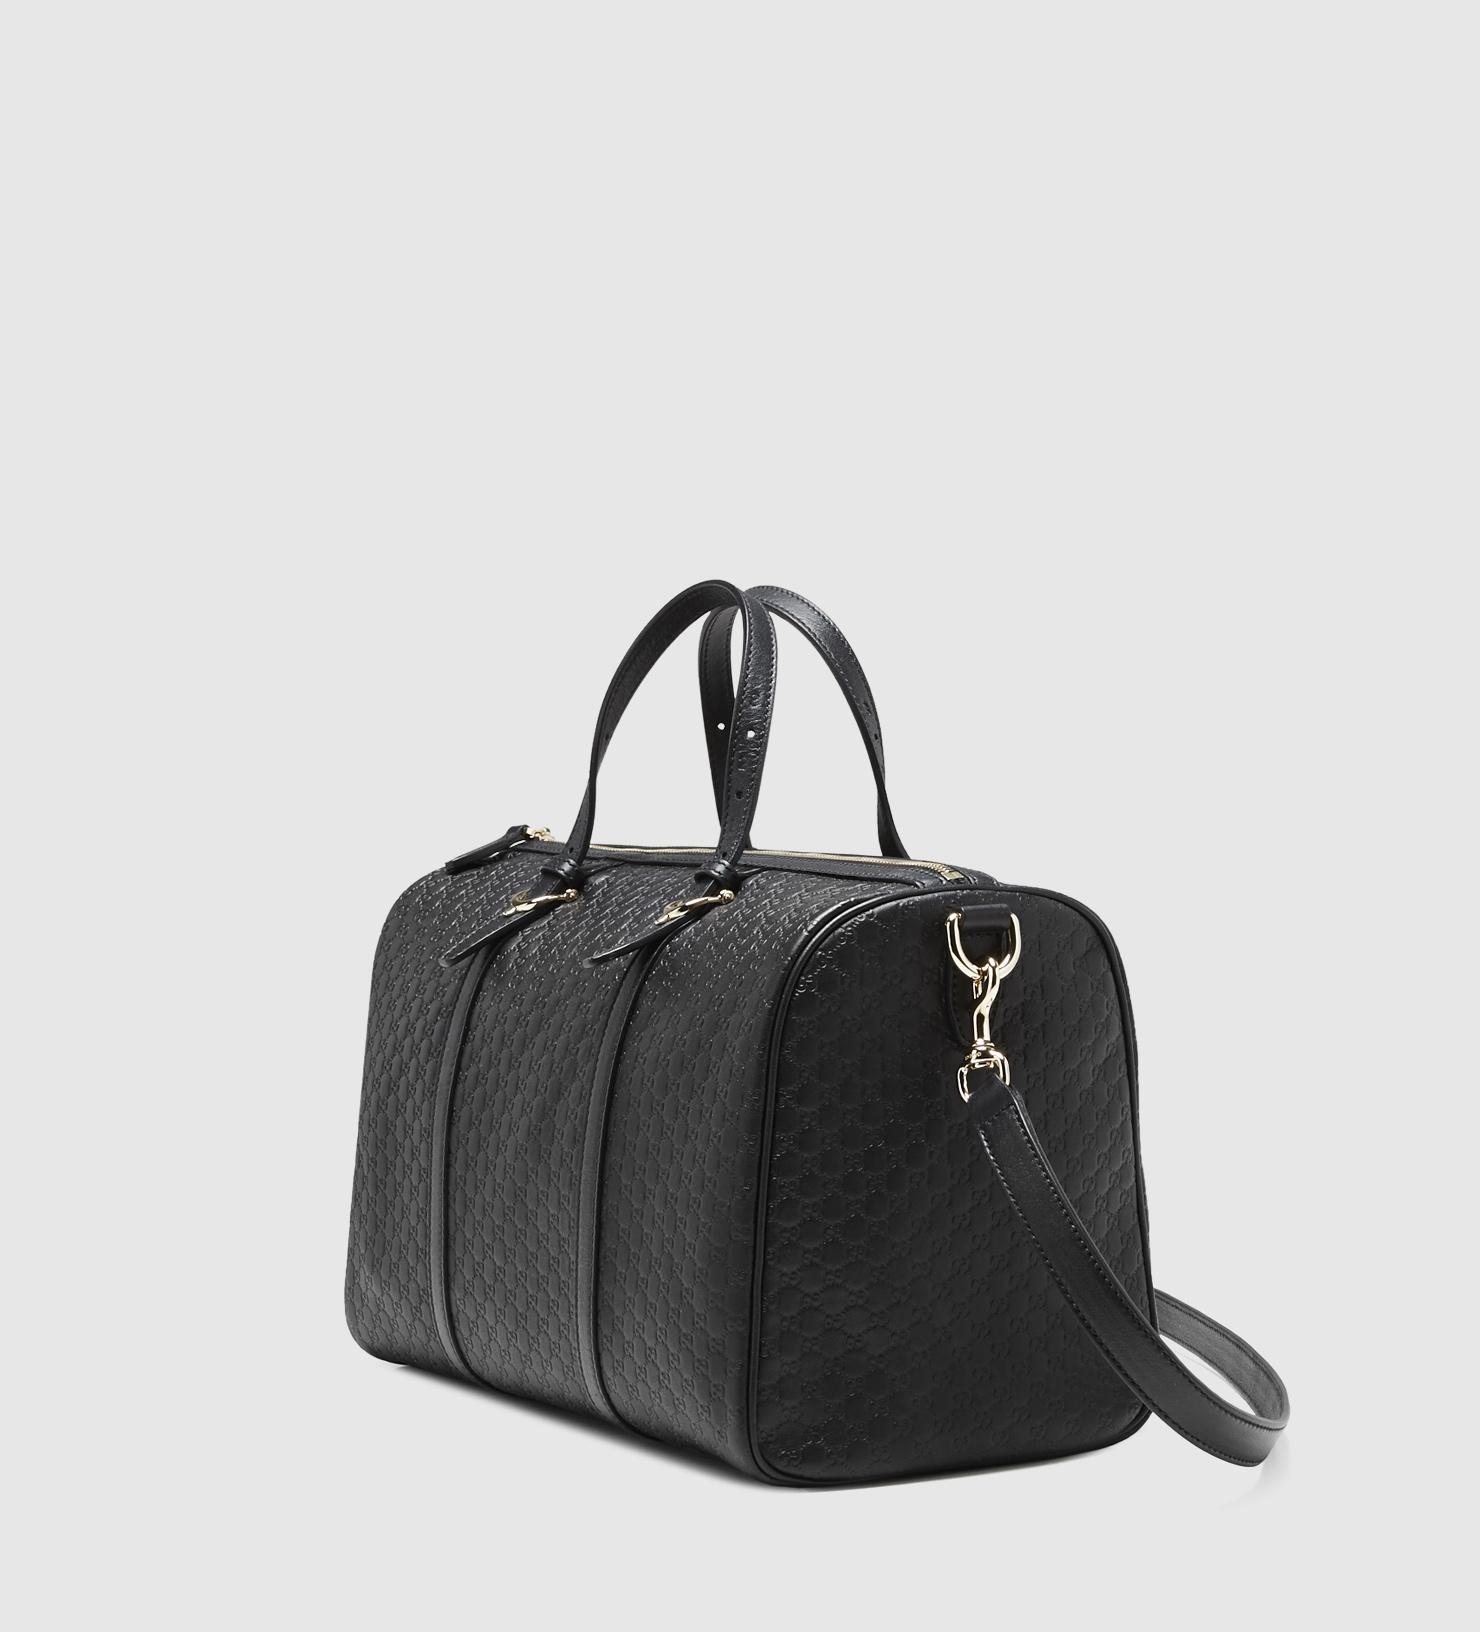 b5756f7fc1f Lyst - Gucci Nice Microguccissima-Leather Boston Bag in Black